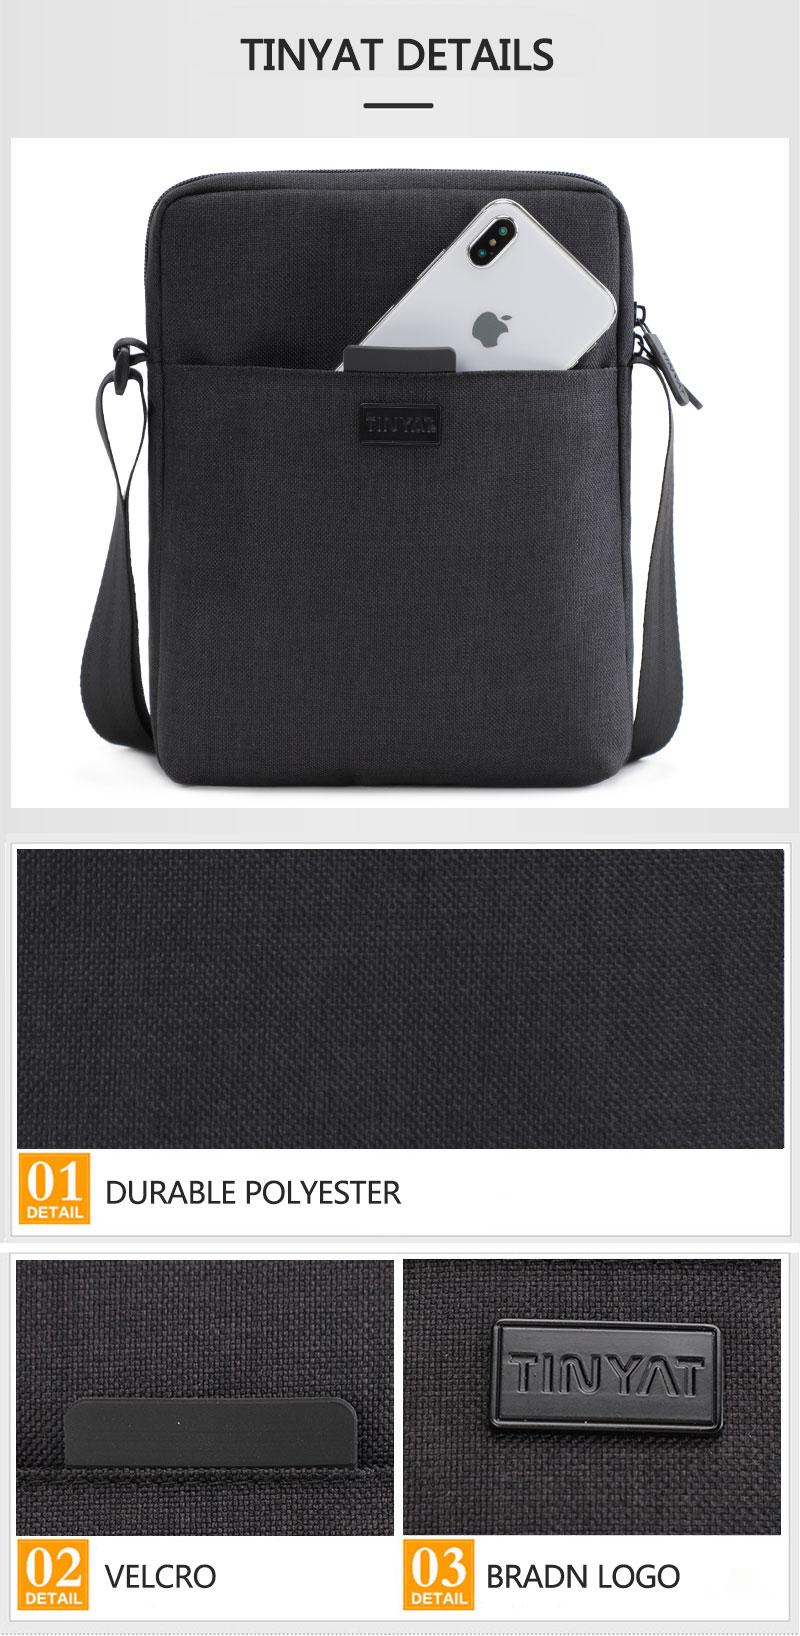 TINYAT Light Canvas Men's Shoulder Bag For 7.9' Ipad Casual Crossbody Bag Waterproof Business Shoulder bag for men 0.13kg 11